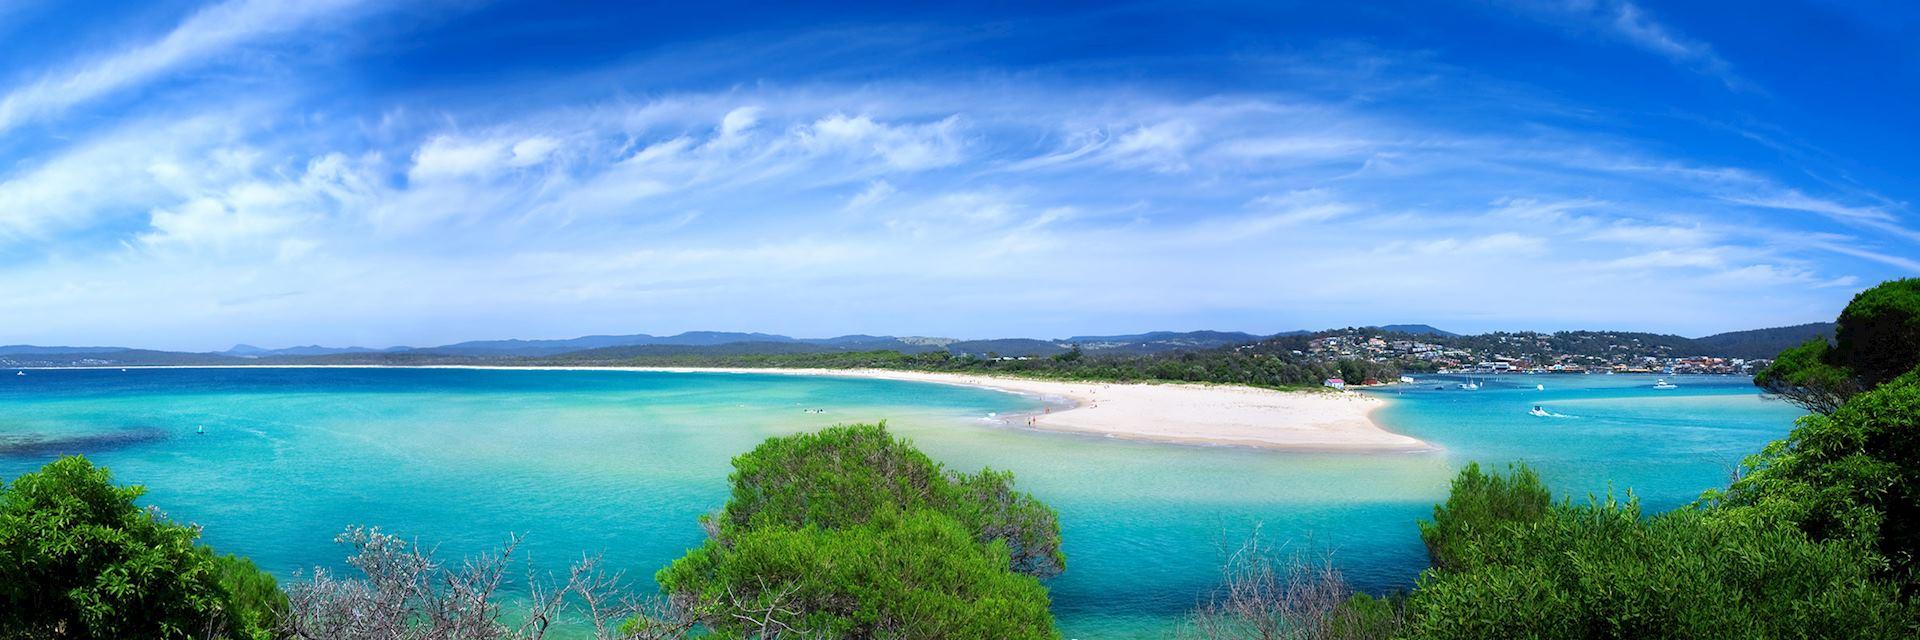 Merimbula, the Sapphire Coast